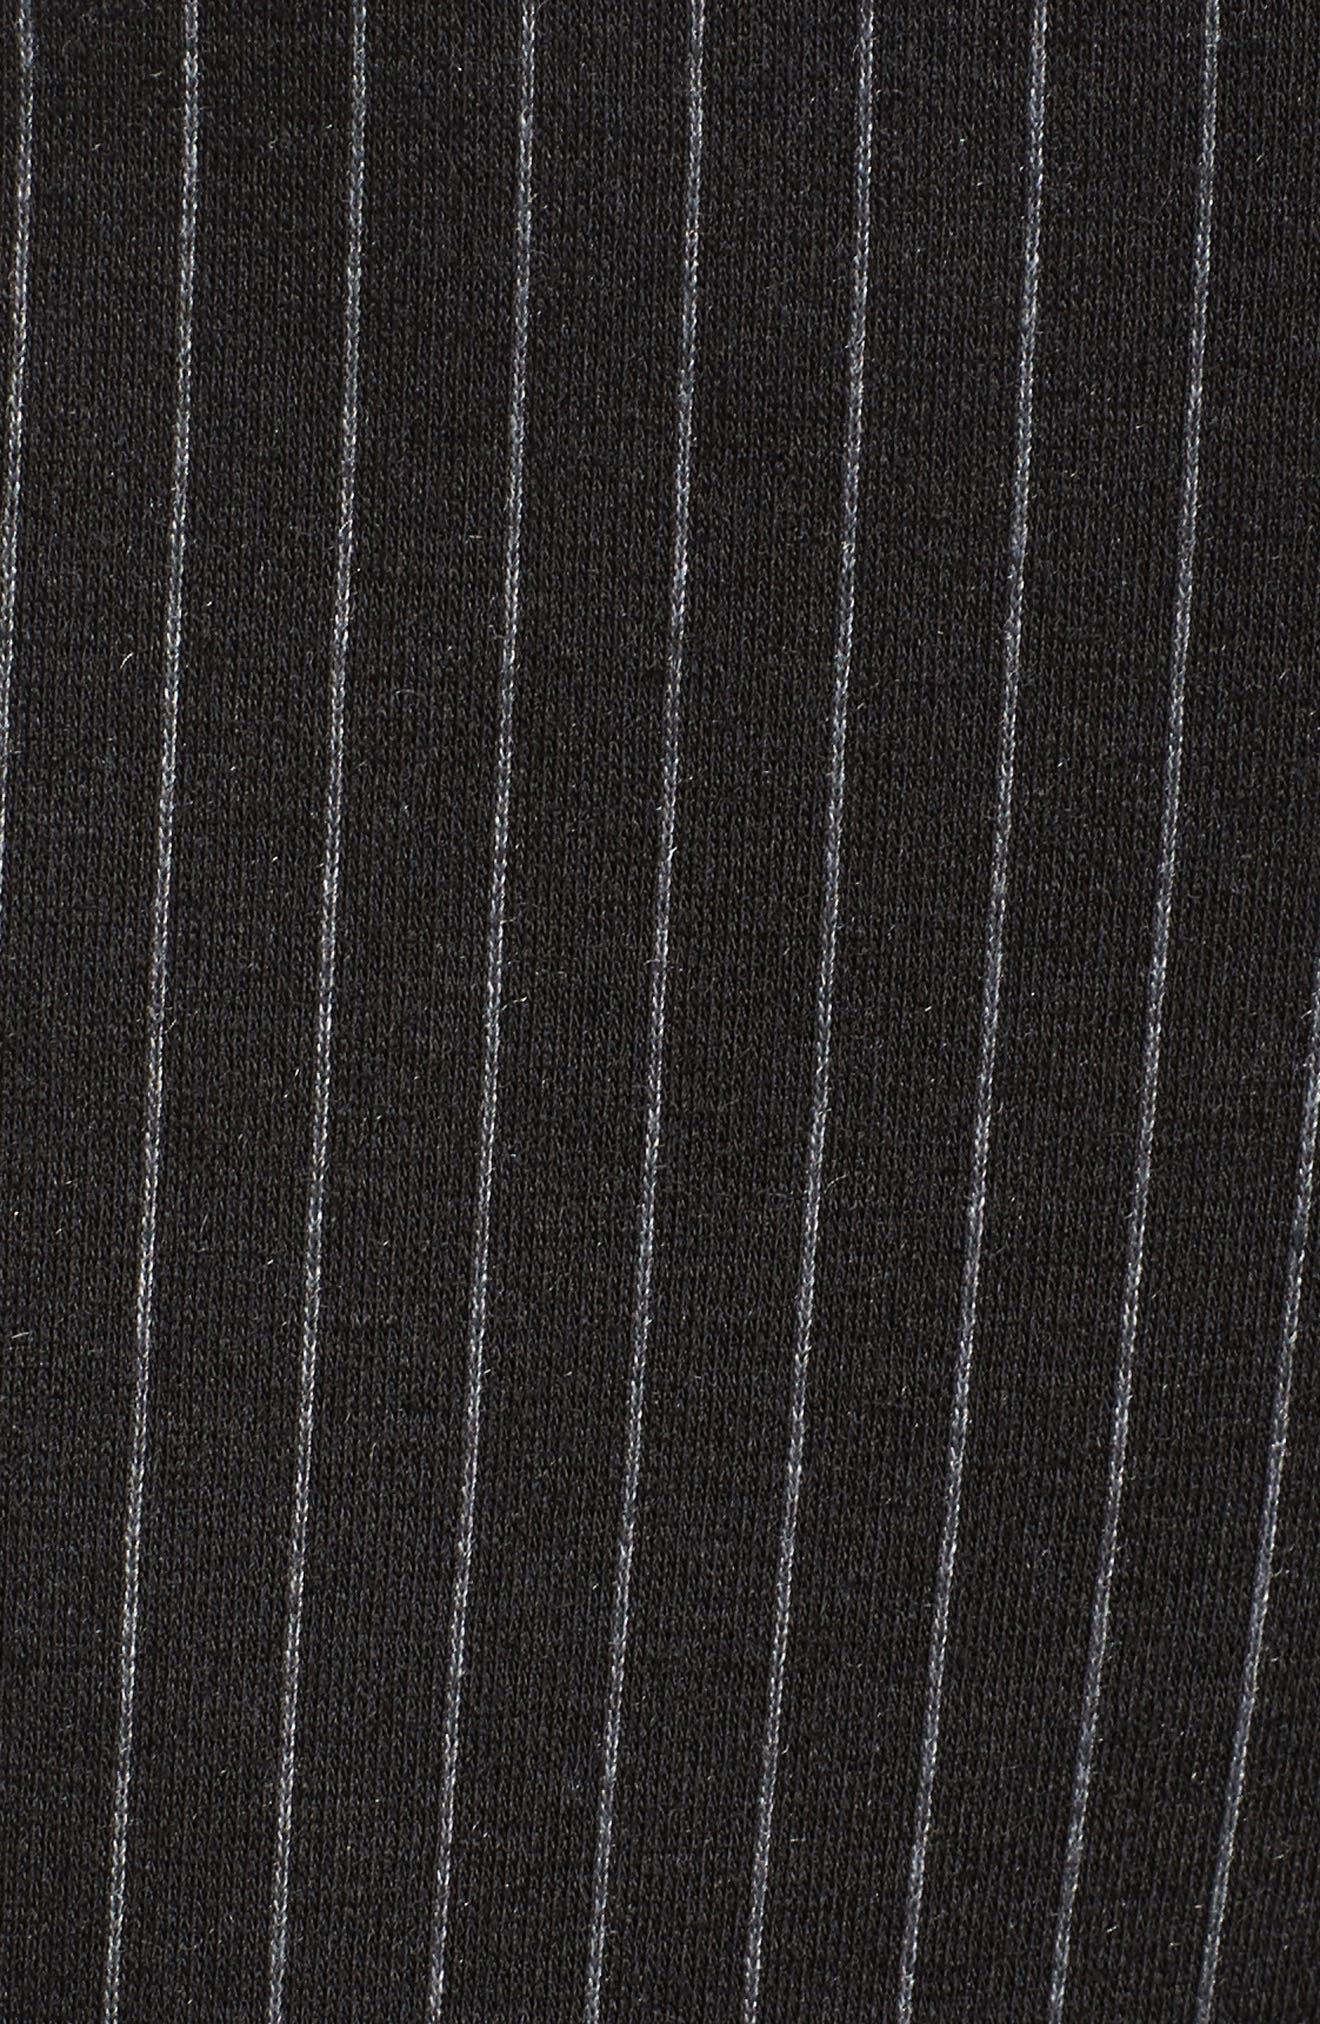 Pinstripe Ankle Pants,                             Alternate thumbnail 5, color,                             001